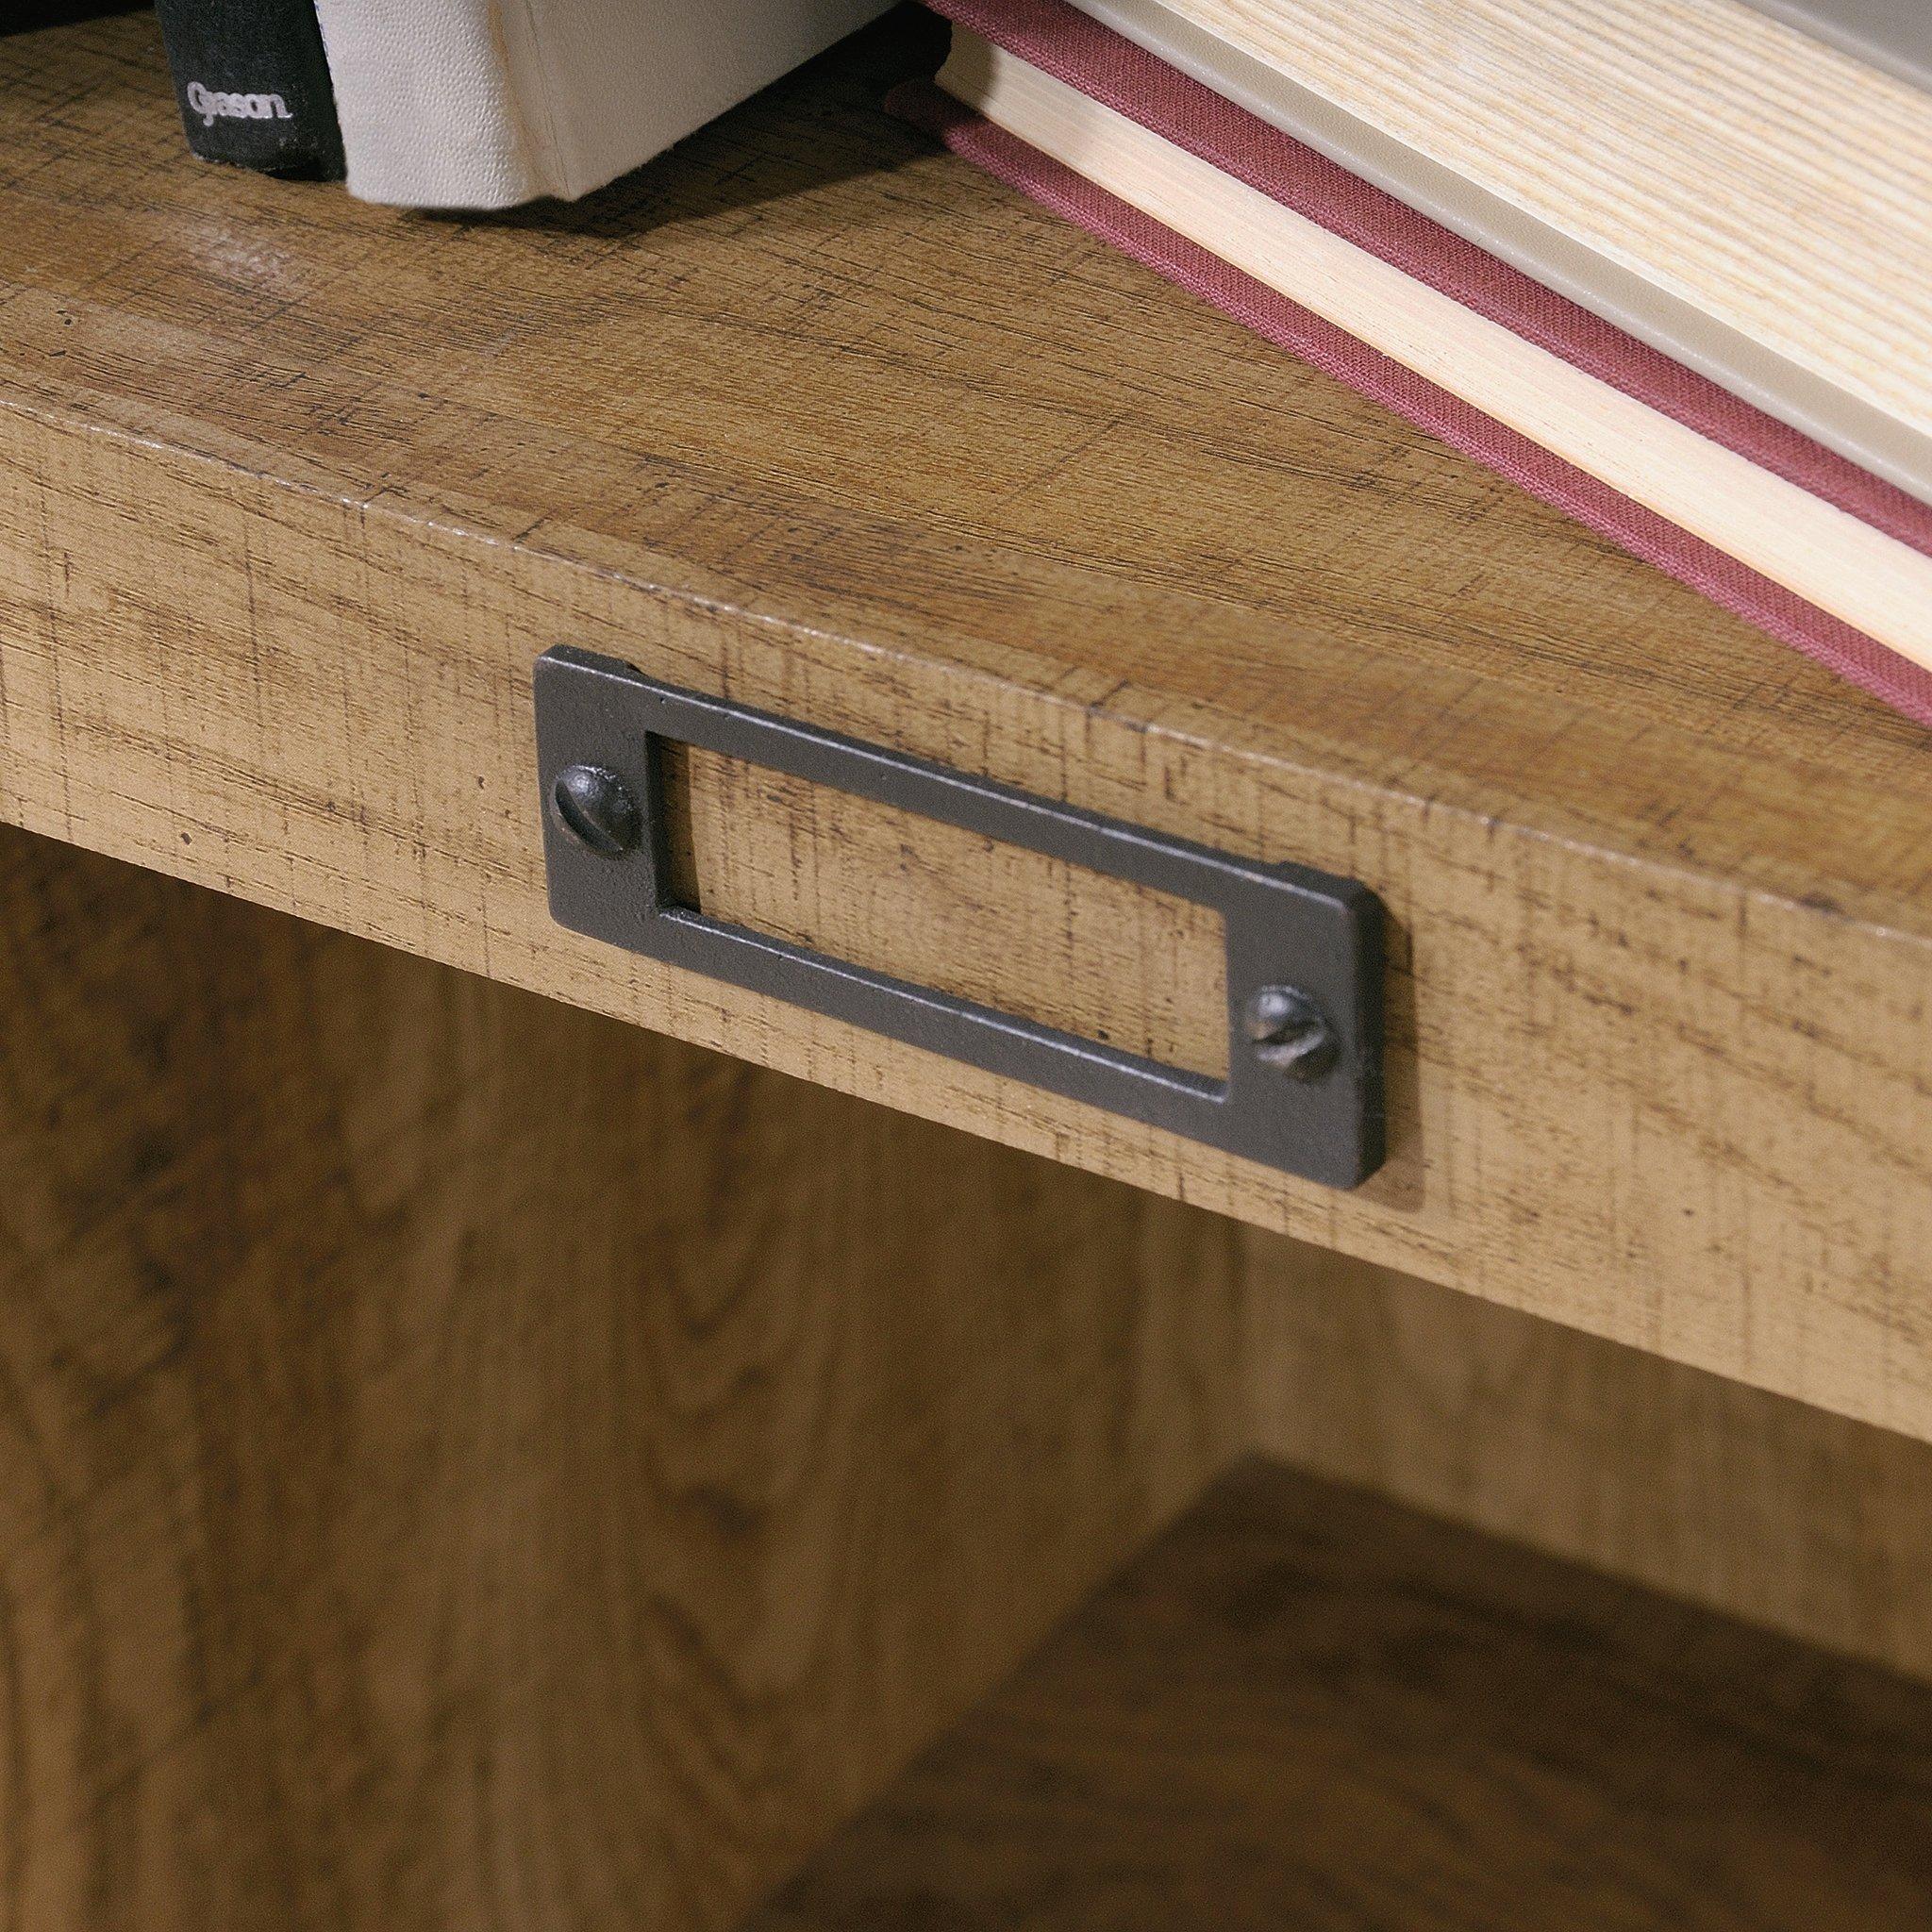 Sauder 414725 Barrister Lane Bookcase, L: 35.55'' x W: 13.50'' x H: 75.04'', Scribed Oak finish by Sauder (Image #6)